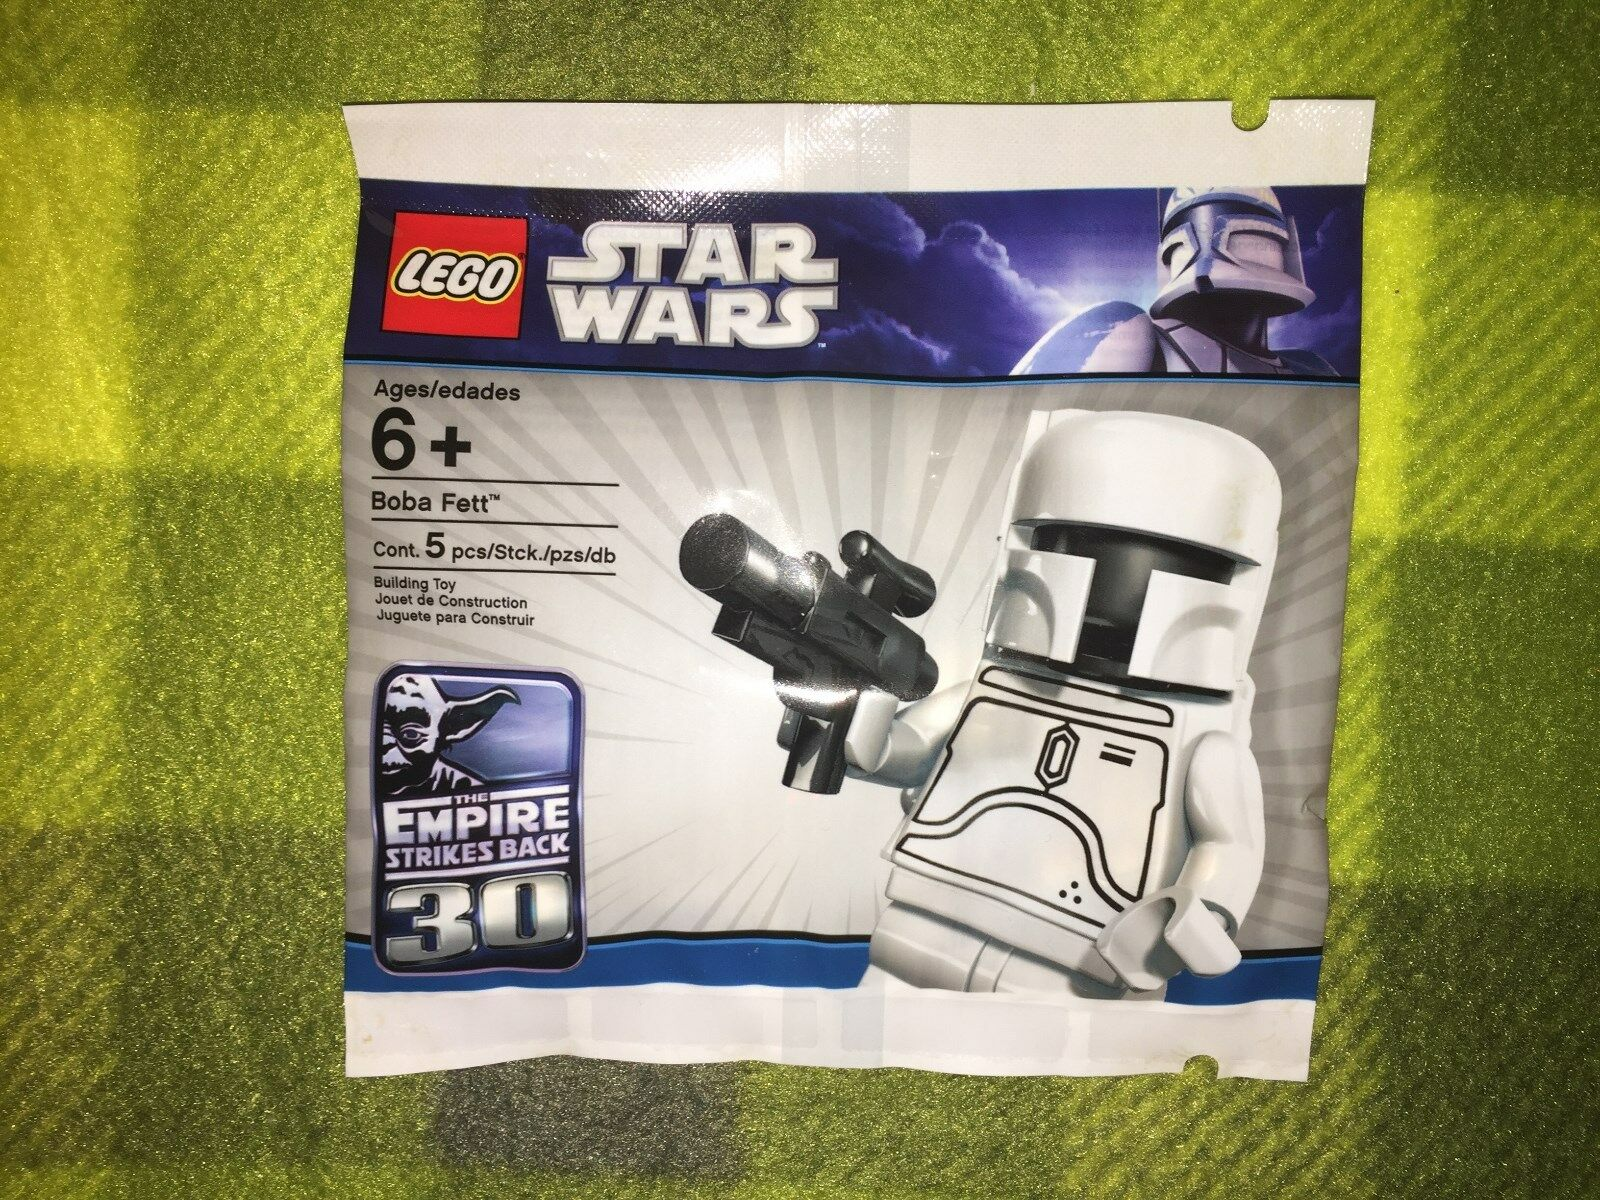 LEGO STAR WARS VERY RARE WHITE BOBA FETT POLYBAG PROMO SEALED - NEW